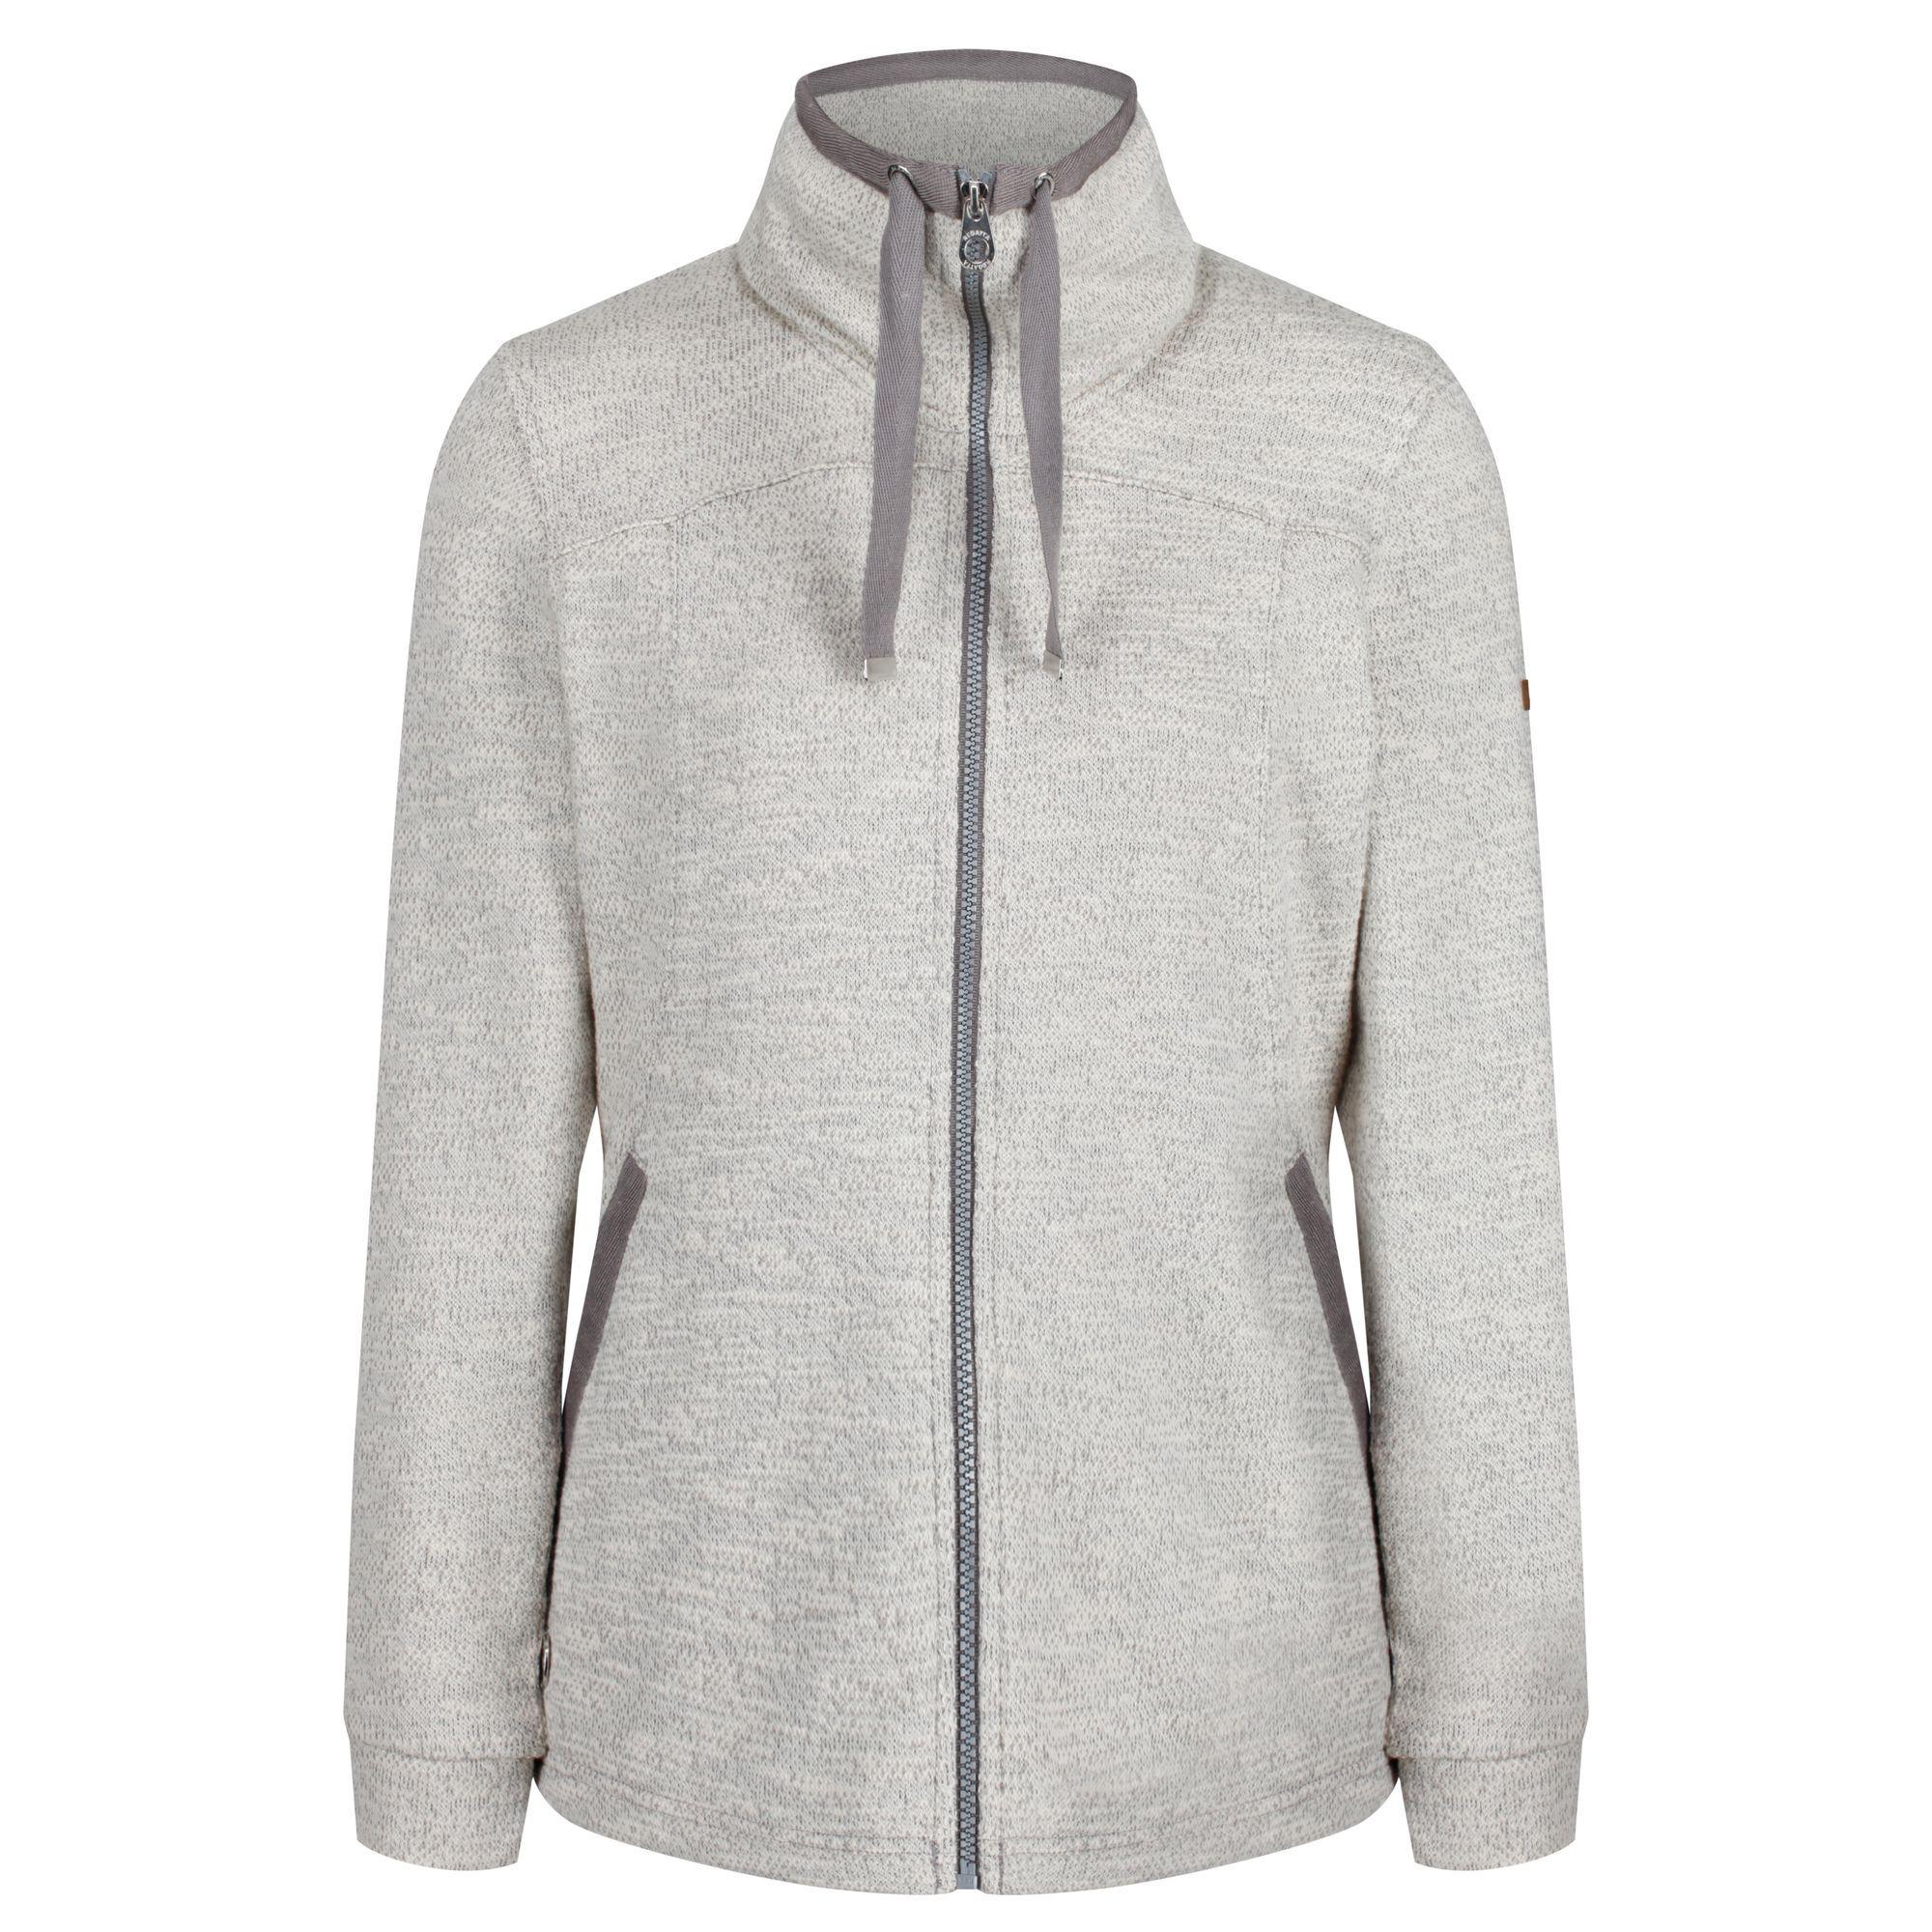 Regatta-Odetta-Womens-Warm-Curved-Full-Zip-Fleece-Jacket-RRP-50 thumbnail 12